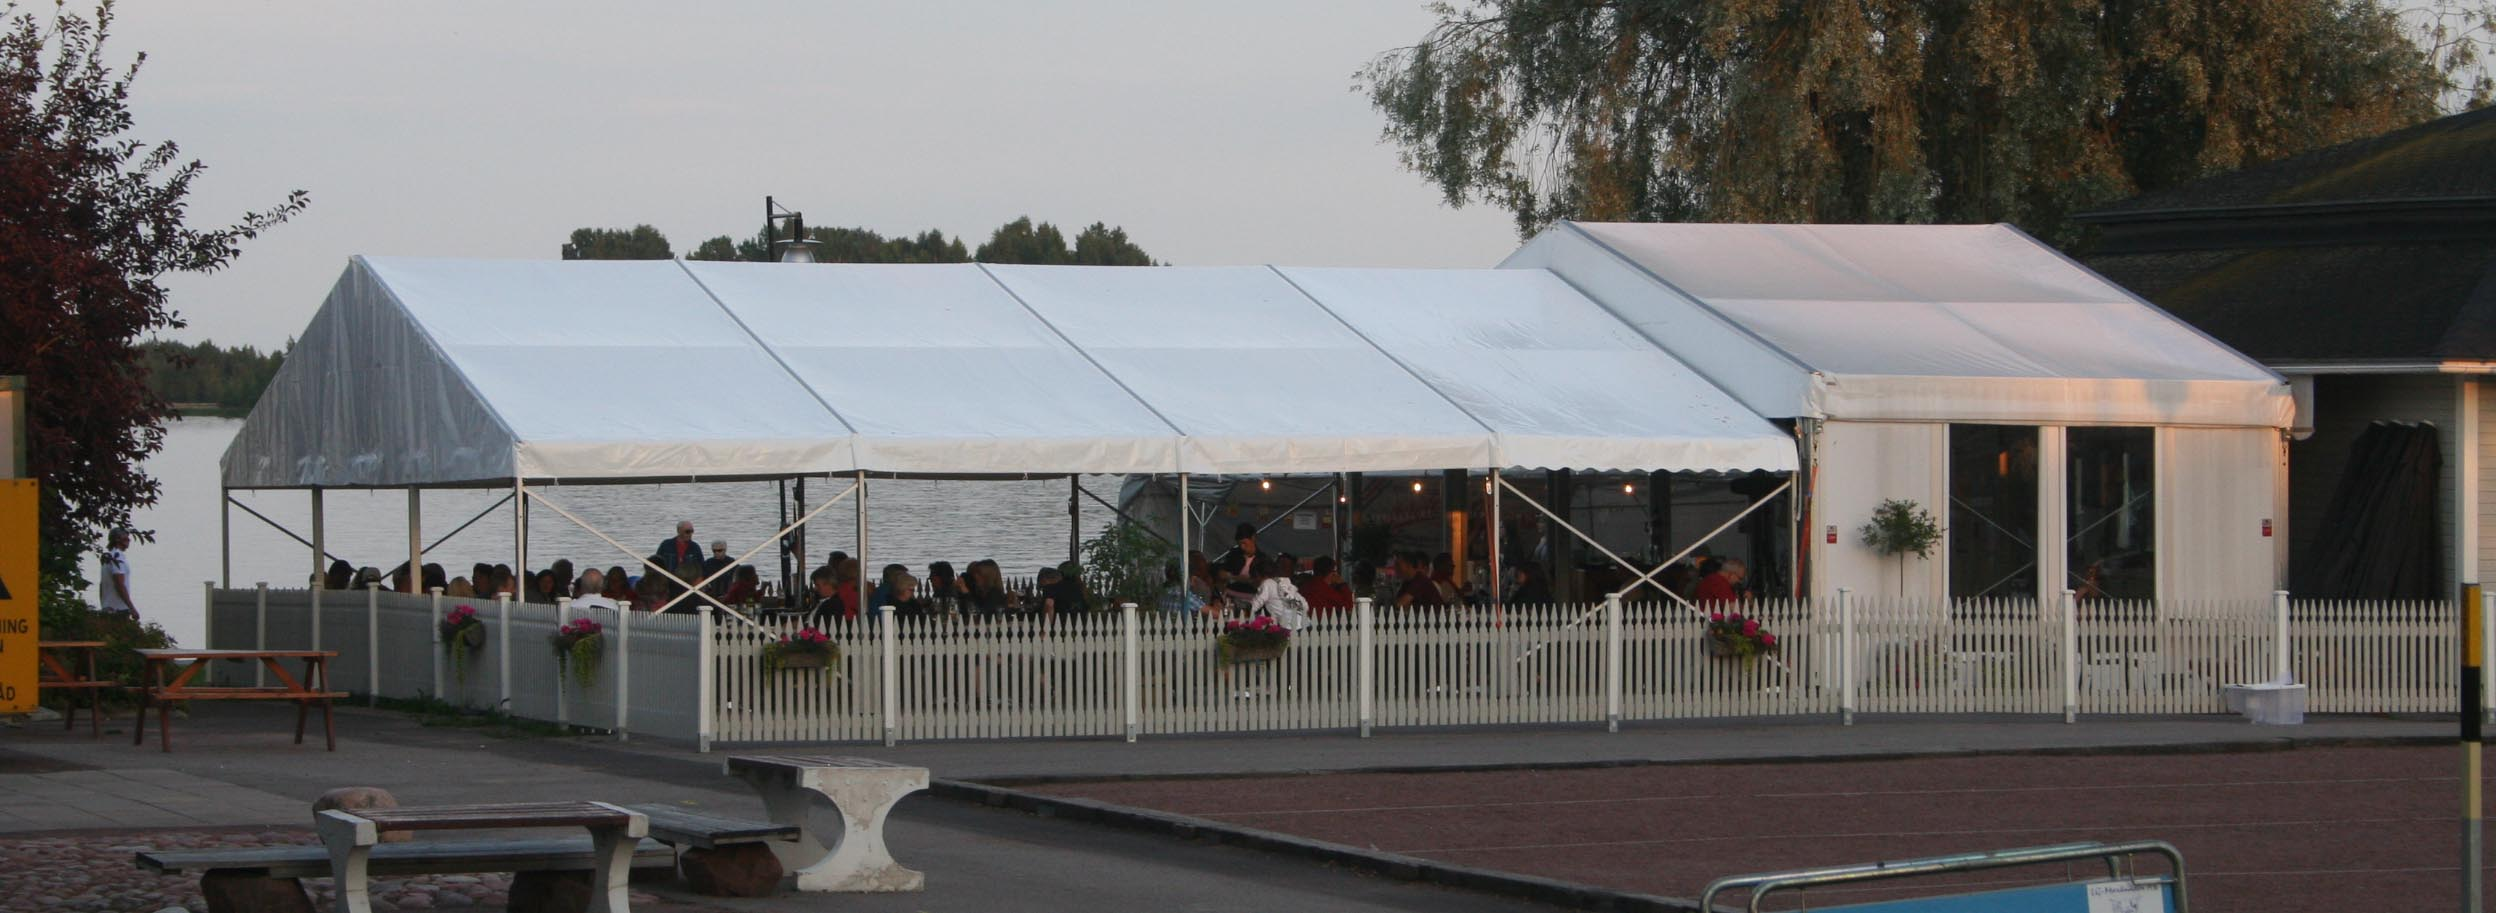 Restaurangtält SeBra Event AB